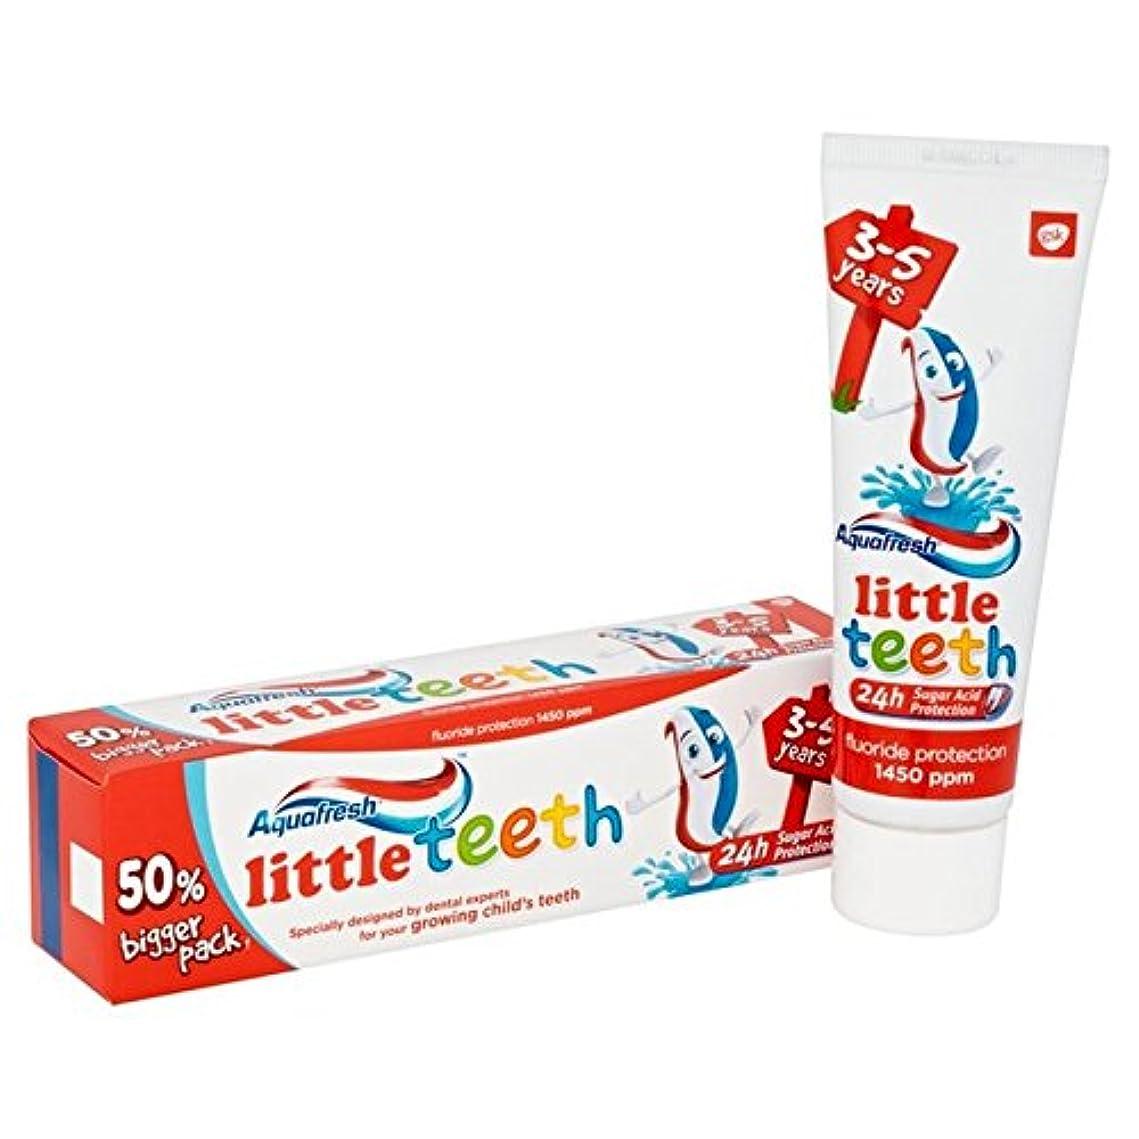 Aquafresh Little Teeth Toothpaste 75ml - アクアフレッシュ少し歯歯磨き粉75ミリリットル [並行輸入品]